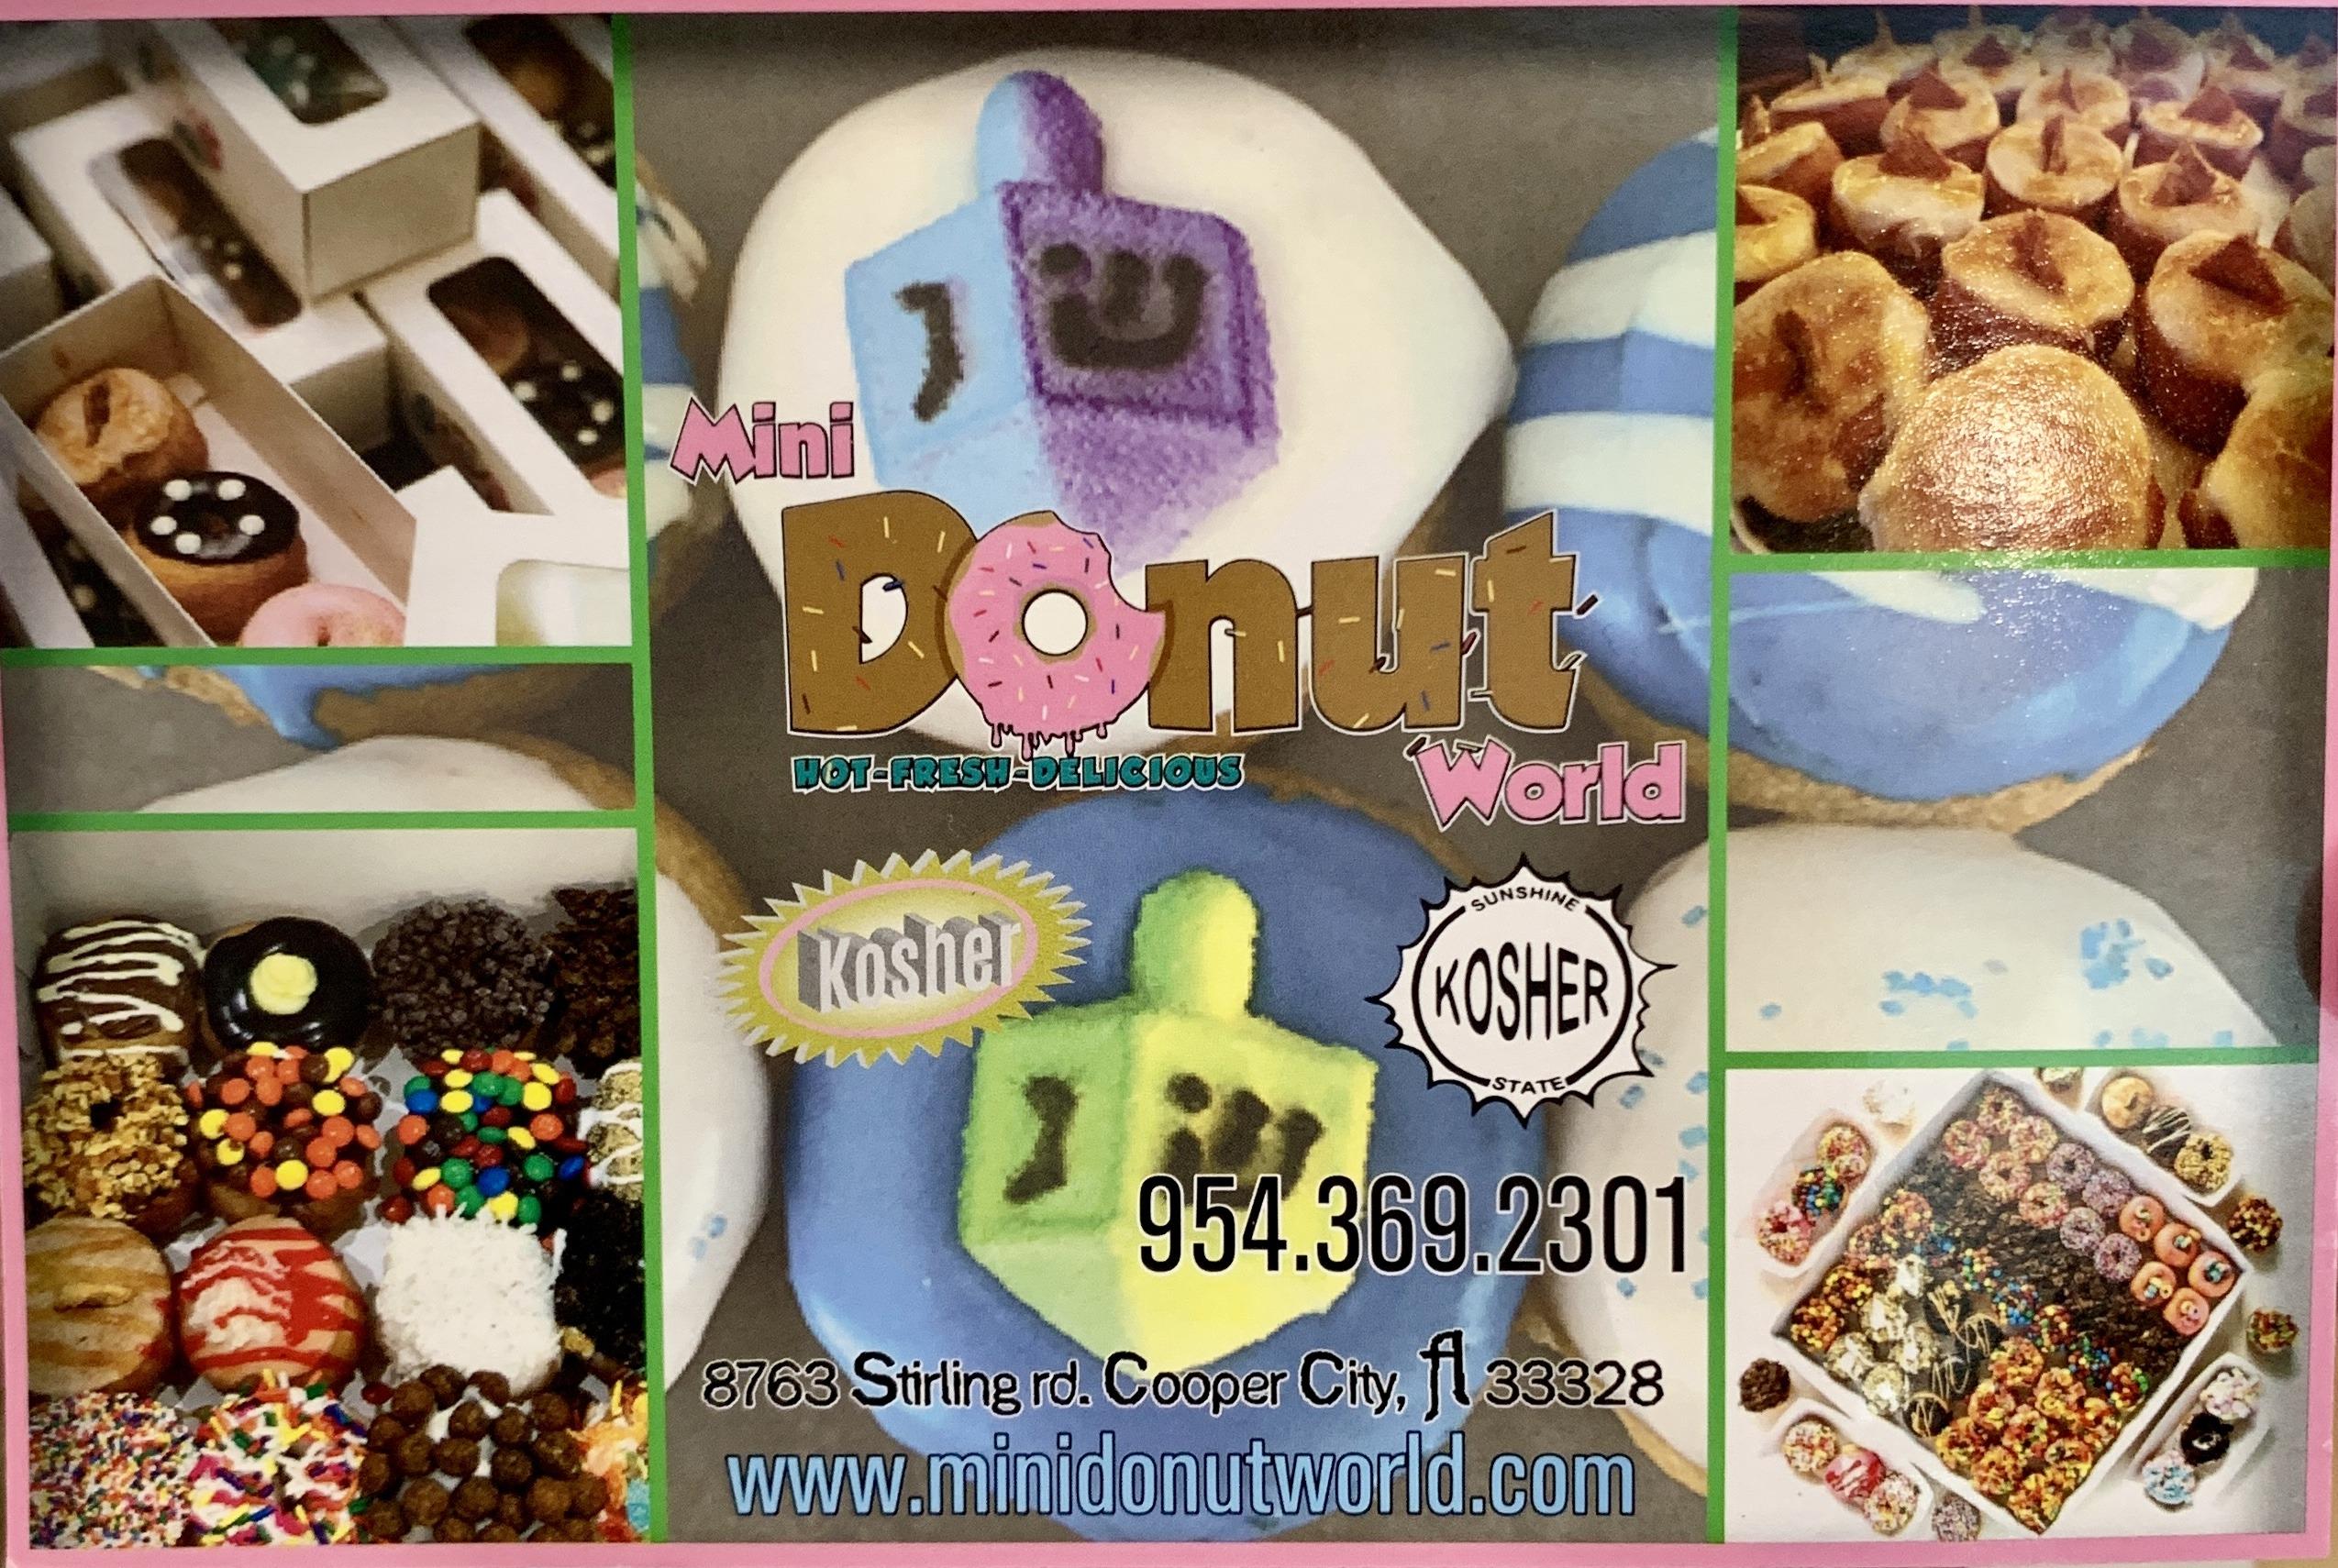 Mini Donut World Website Graphic